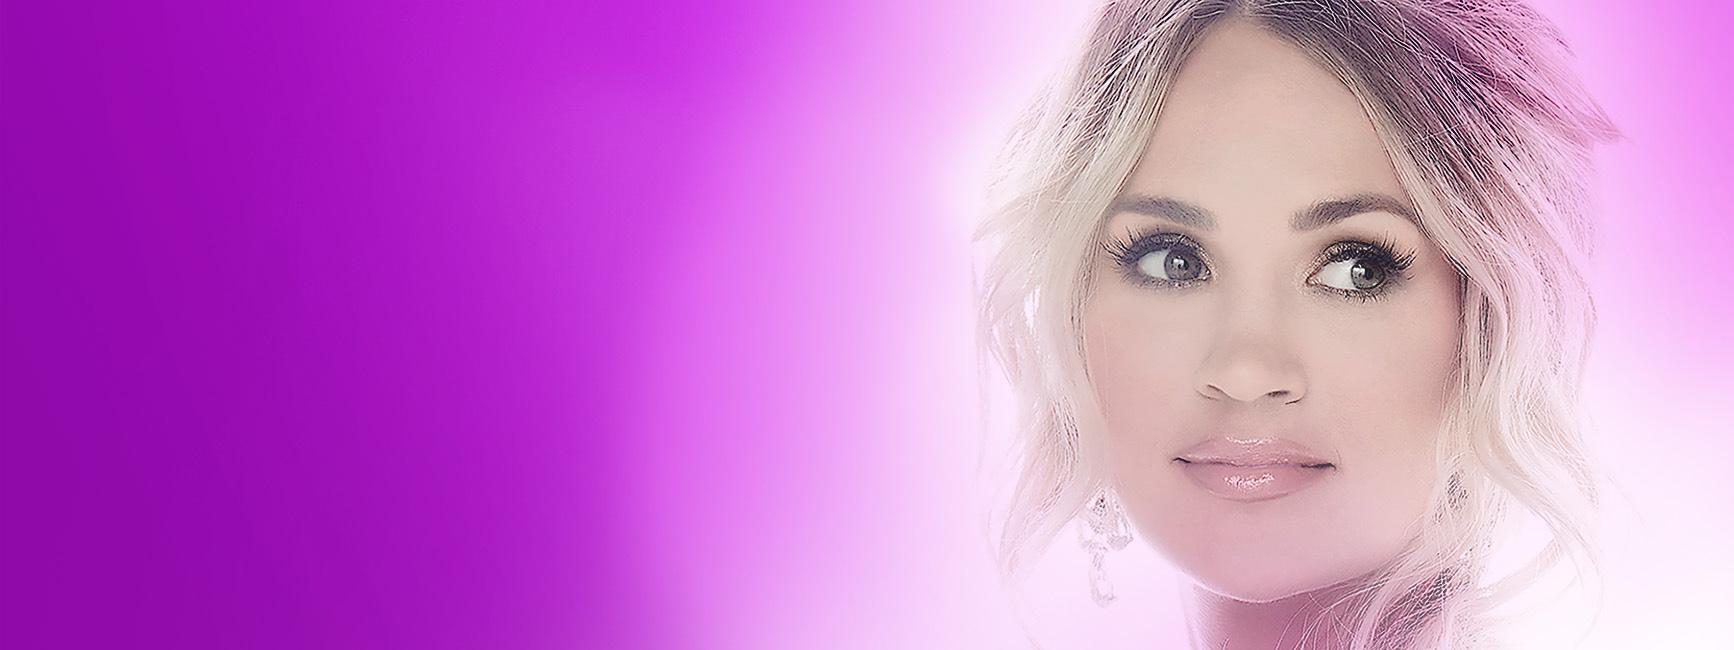 Carrie Underwood – My Savior: Live From The Ryman